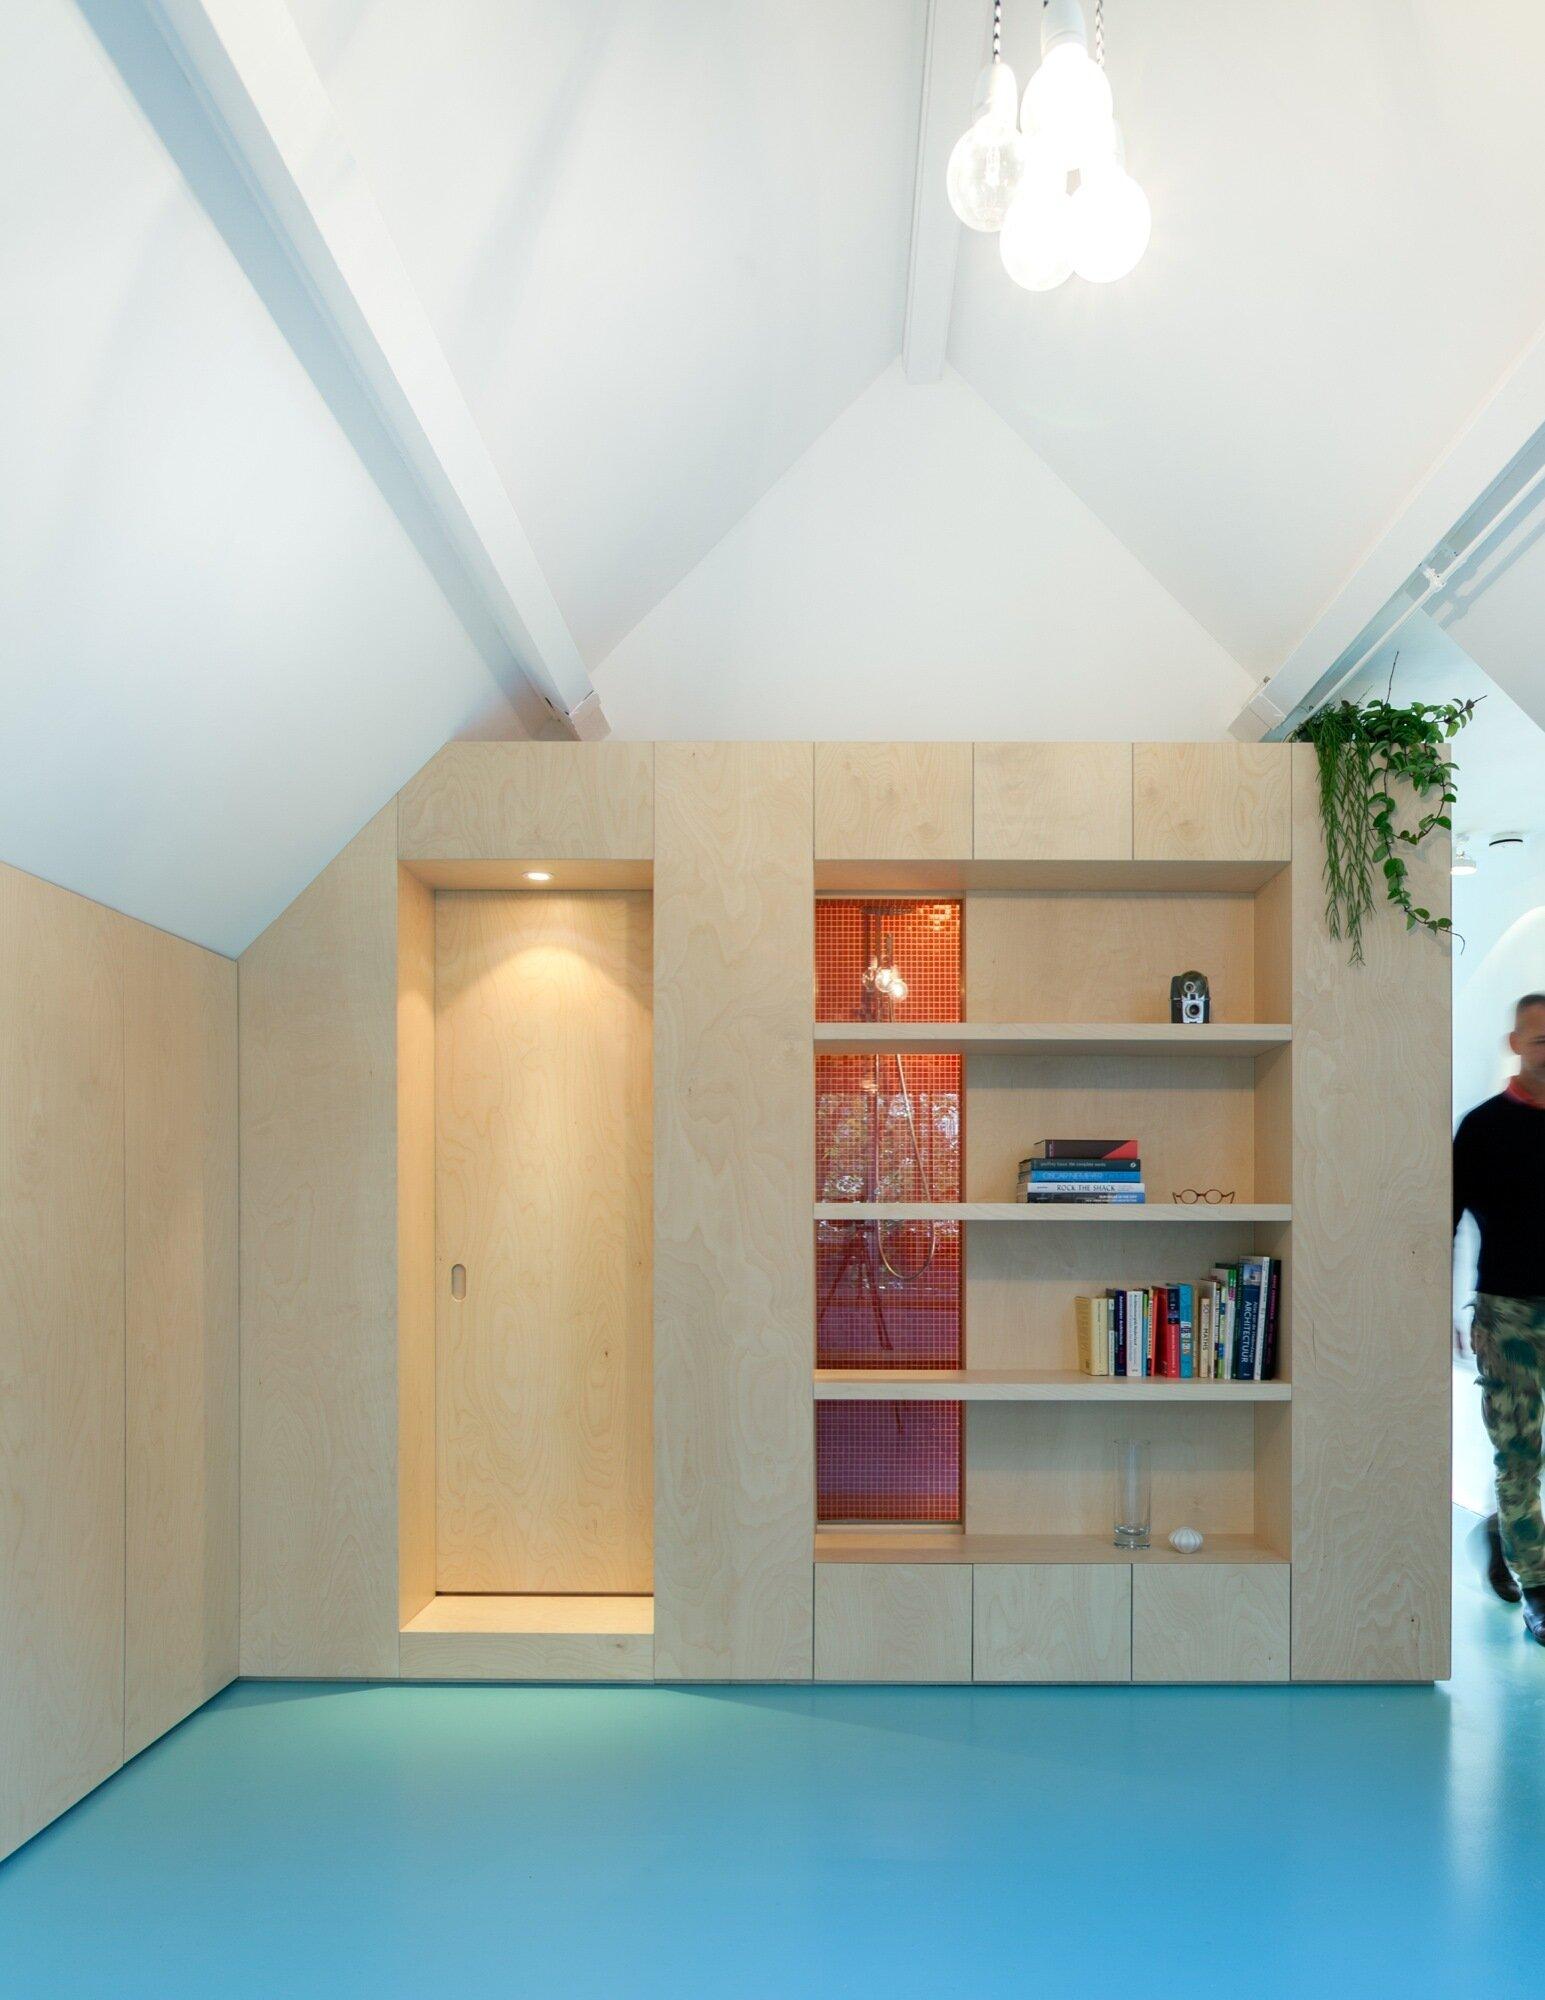 Amsterdam Urban Loft - Bureau Fraai - Amsterdam - Living Room - Humble Homes